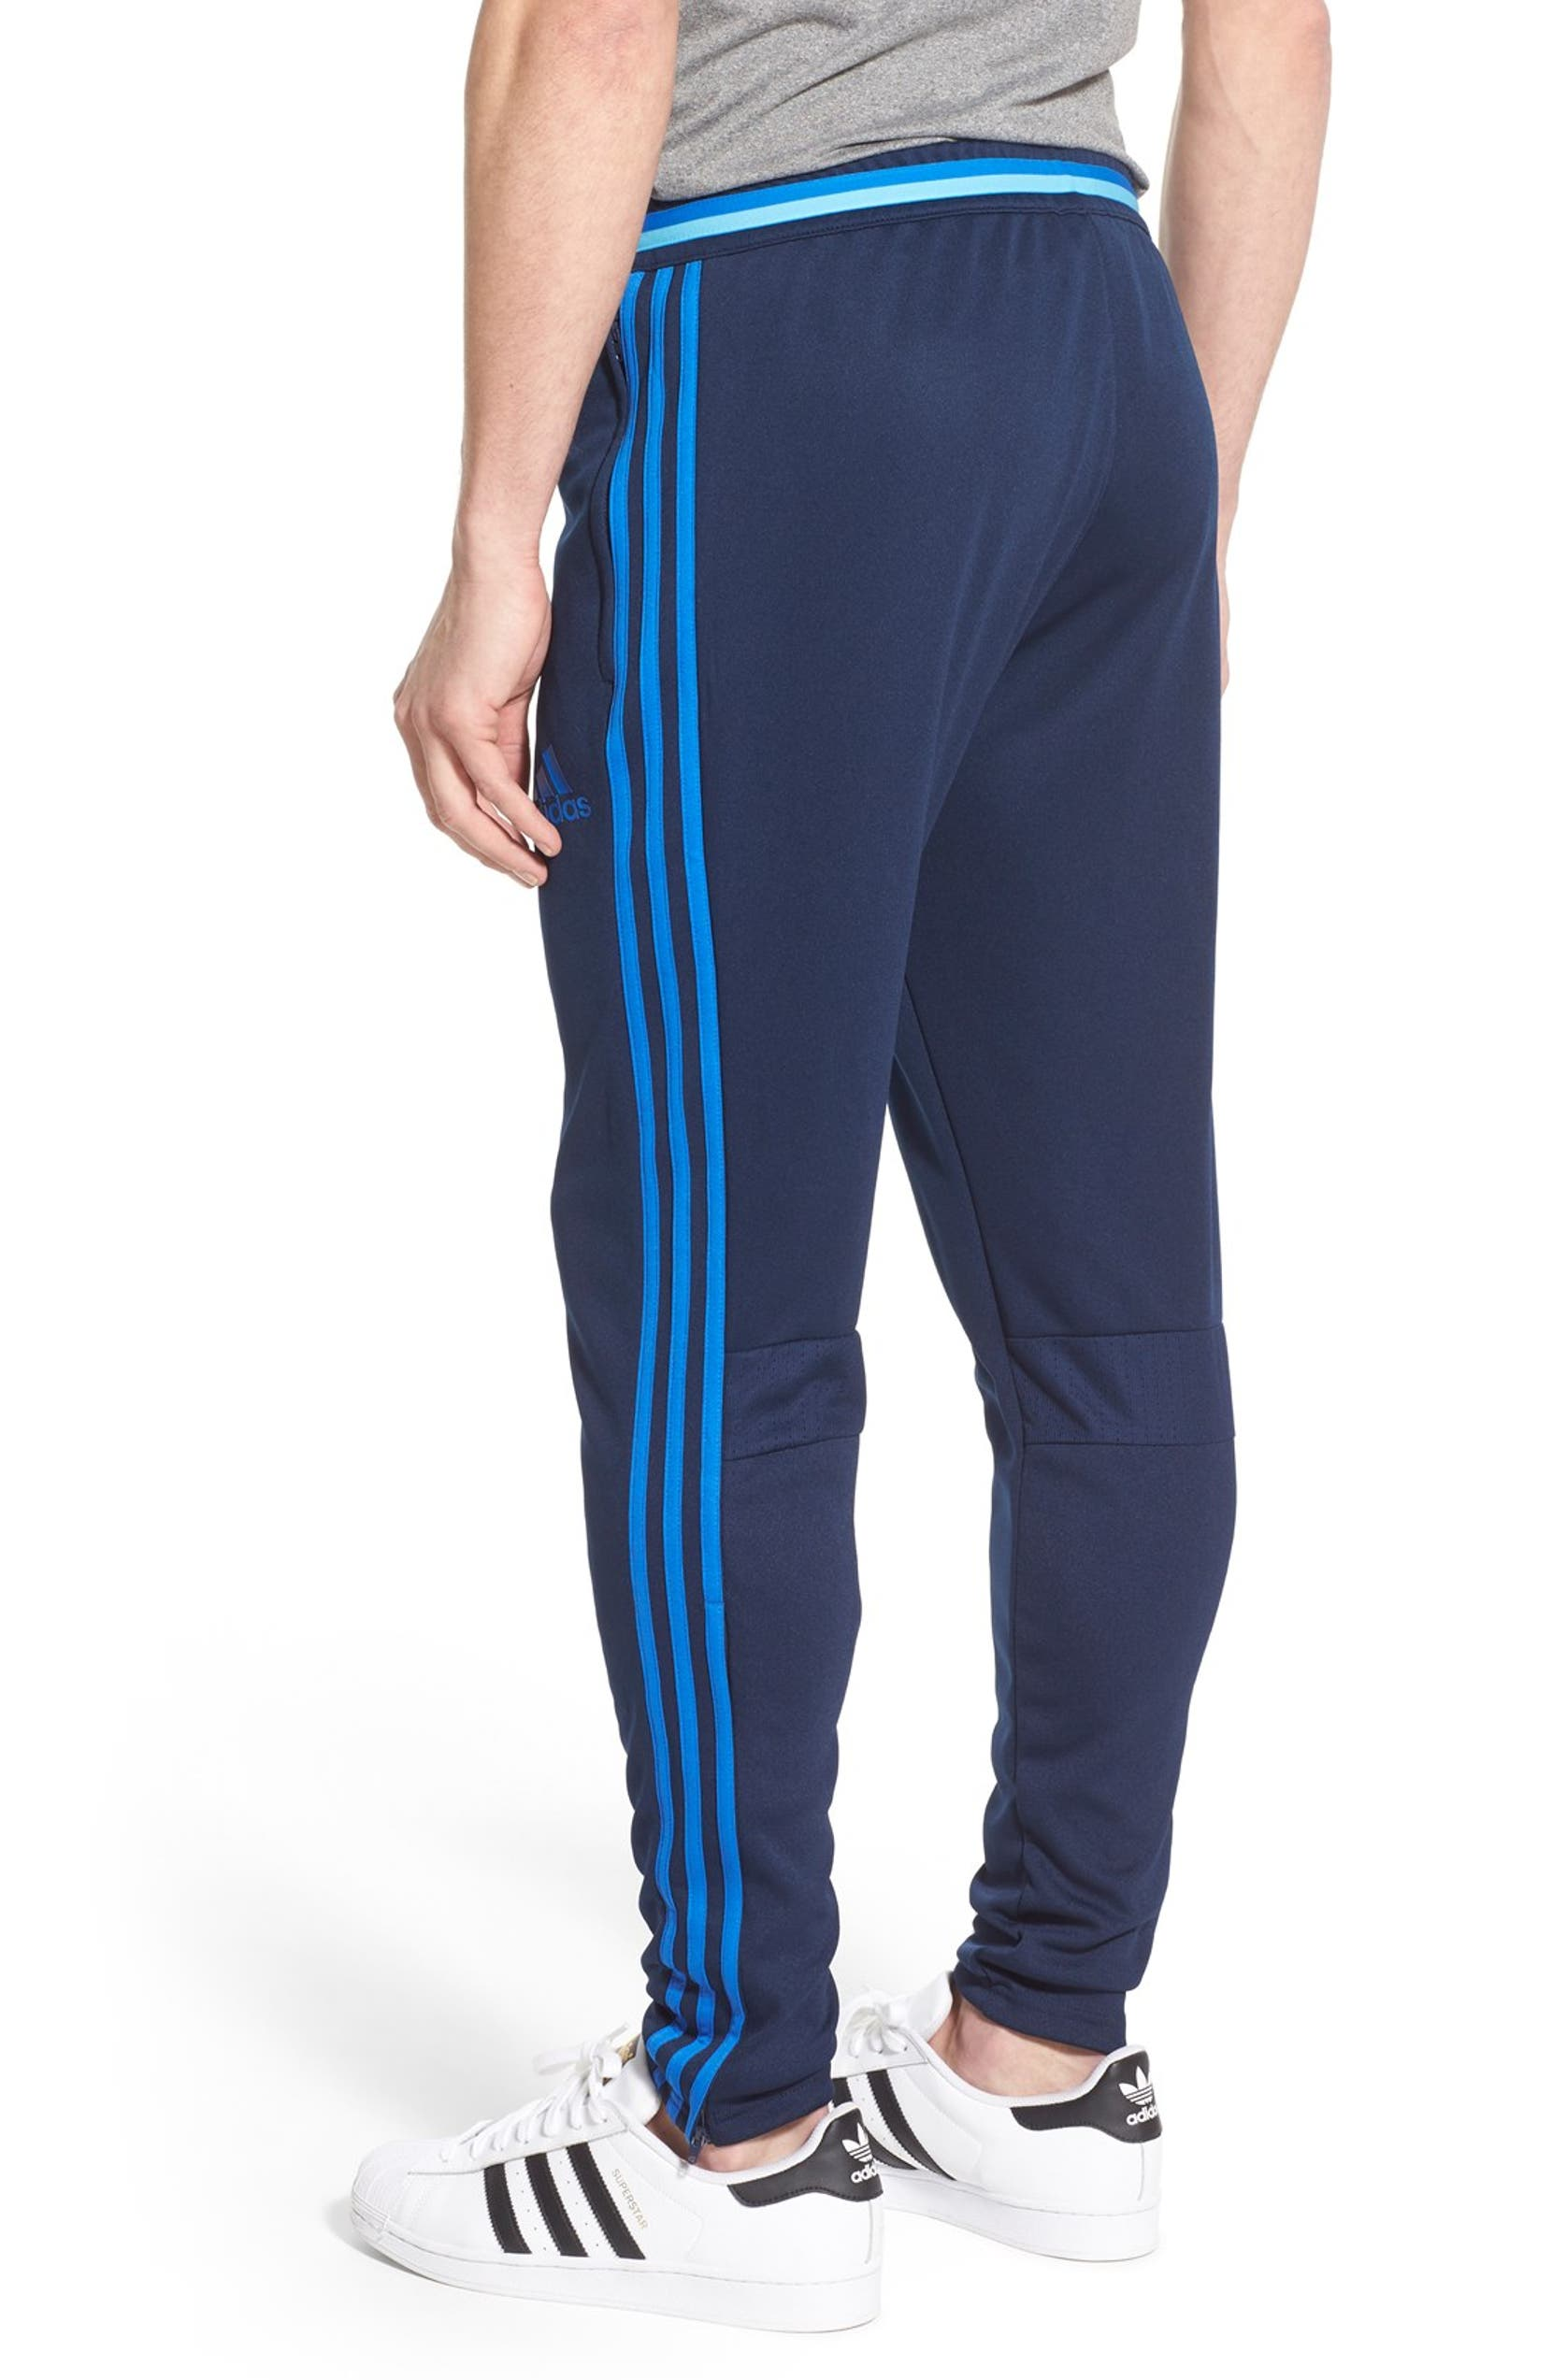 538038e07 adidas Condivo 16 Training Pants | Nordstrom